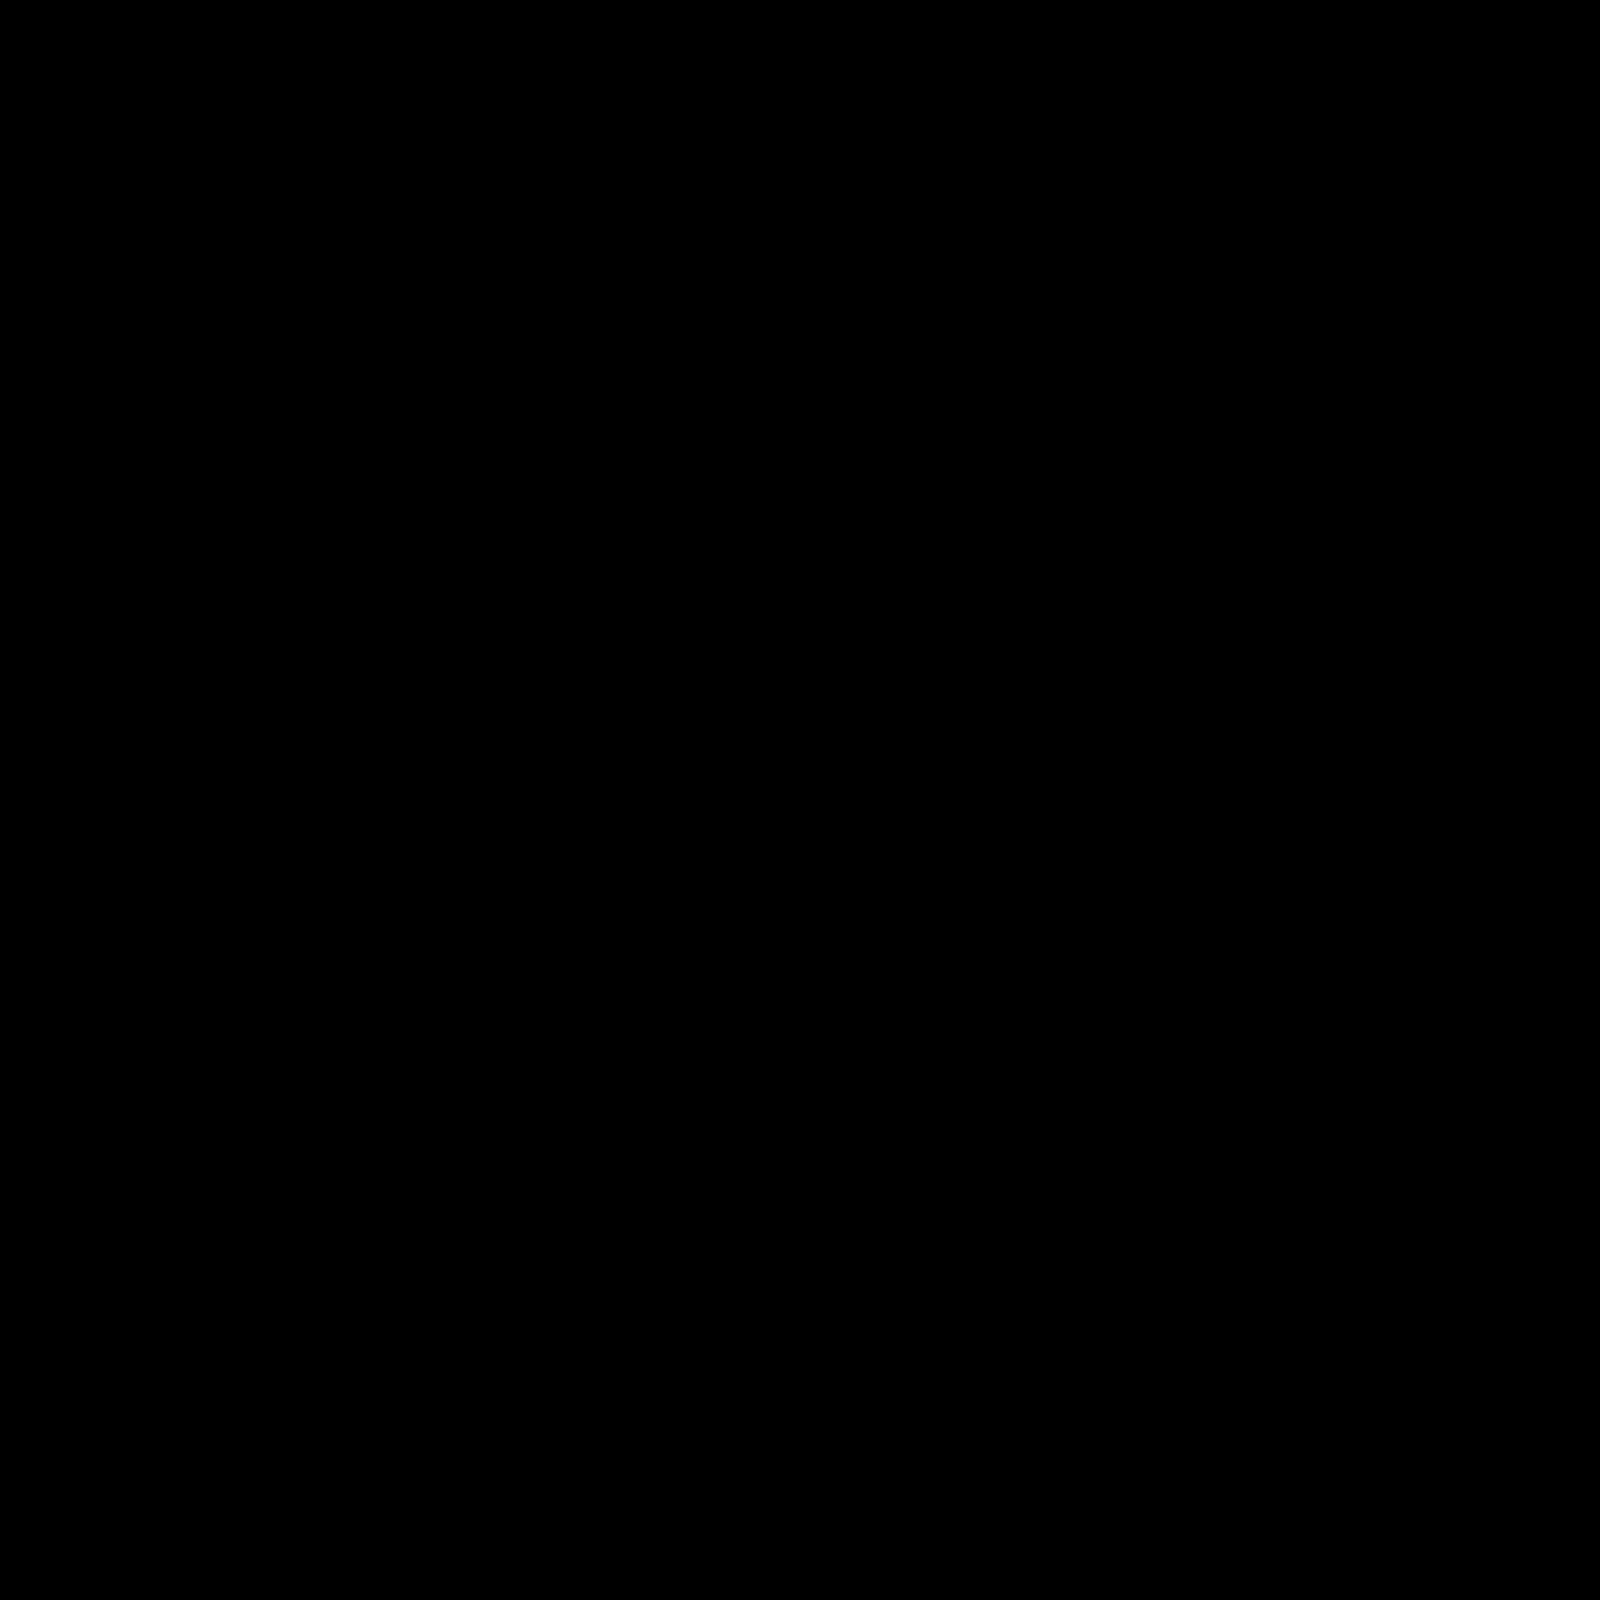 Autograph icon